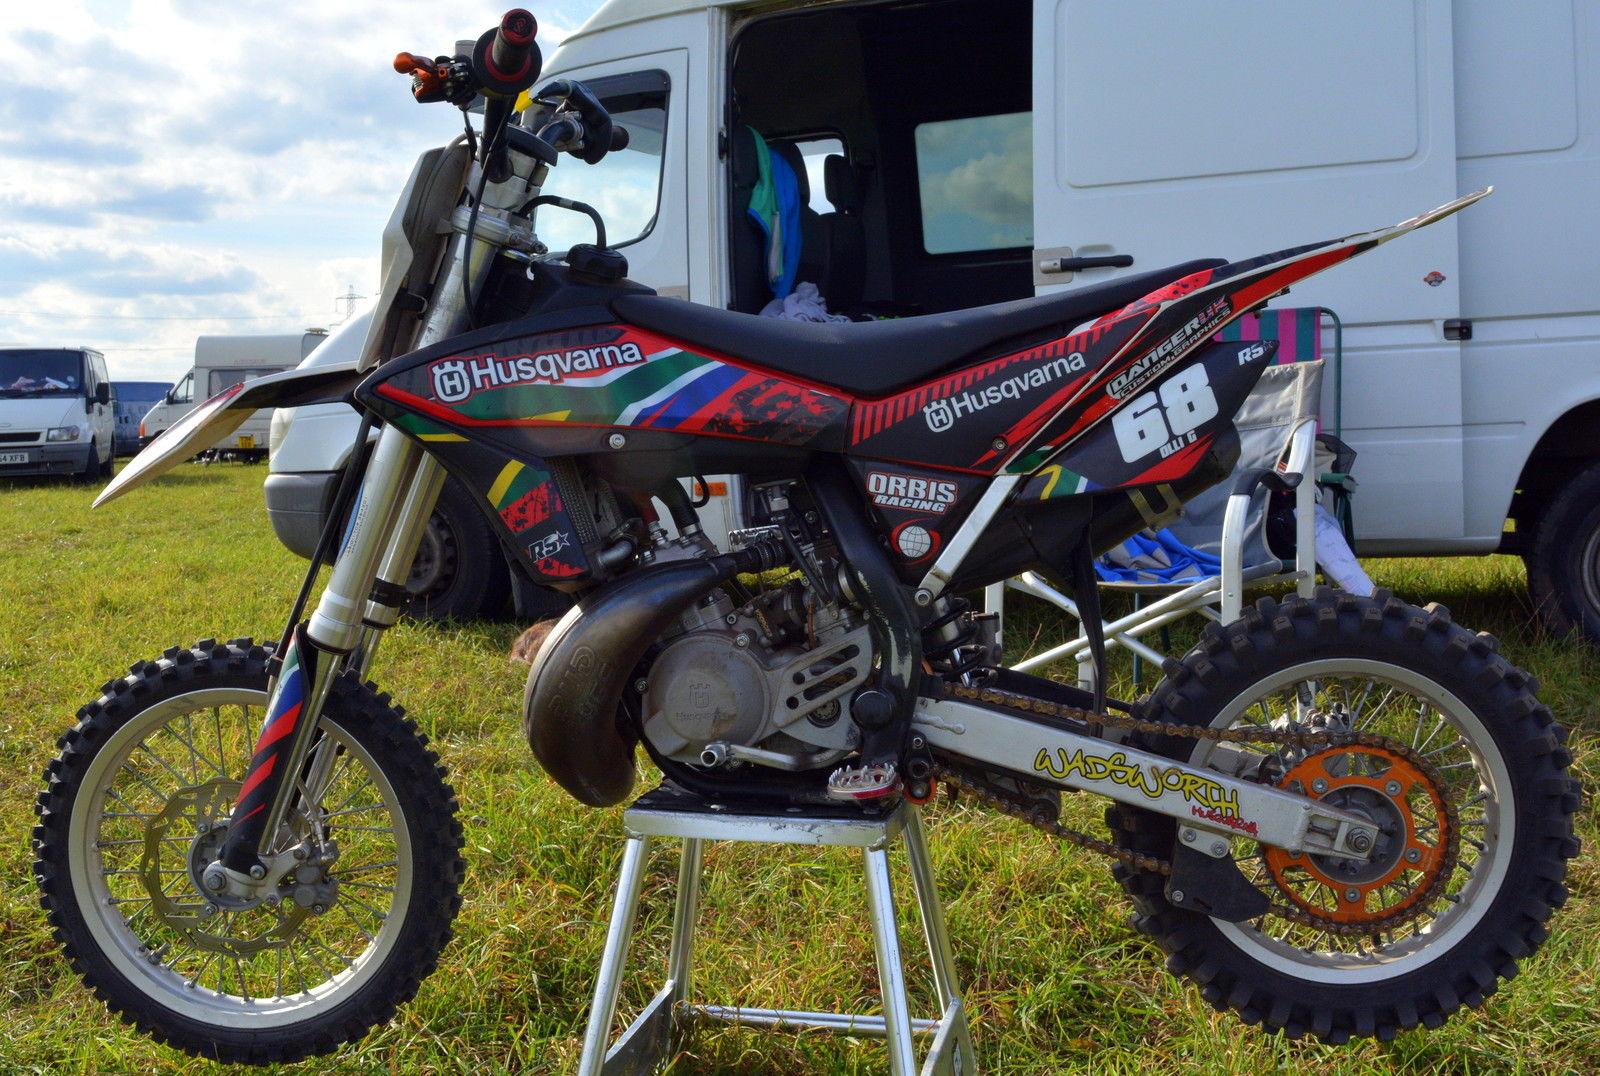 husqvarna 65 cc motocross bike. Black Bedroom Furniture Sets. Home Design Ideas